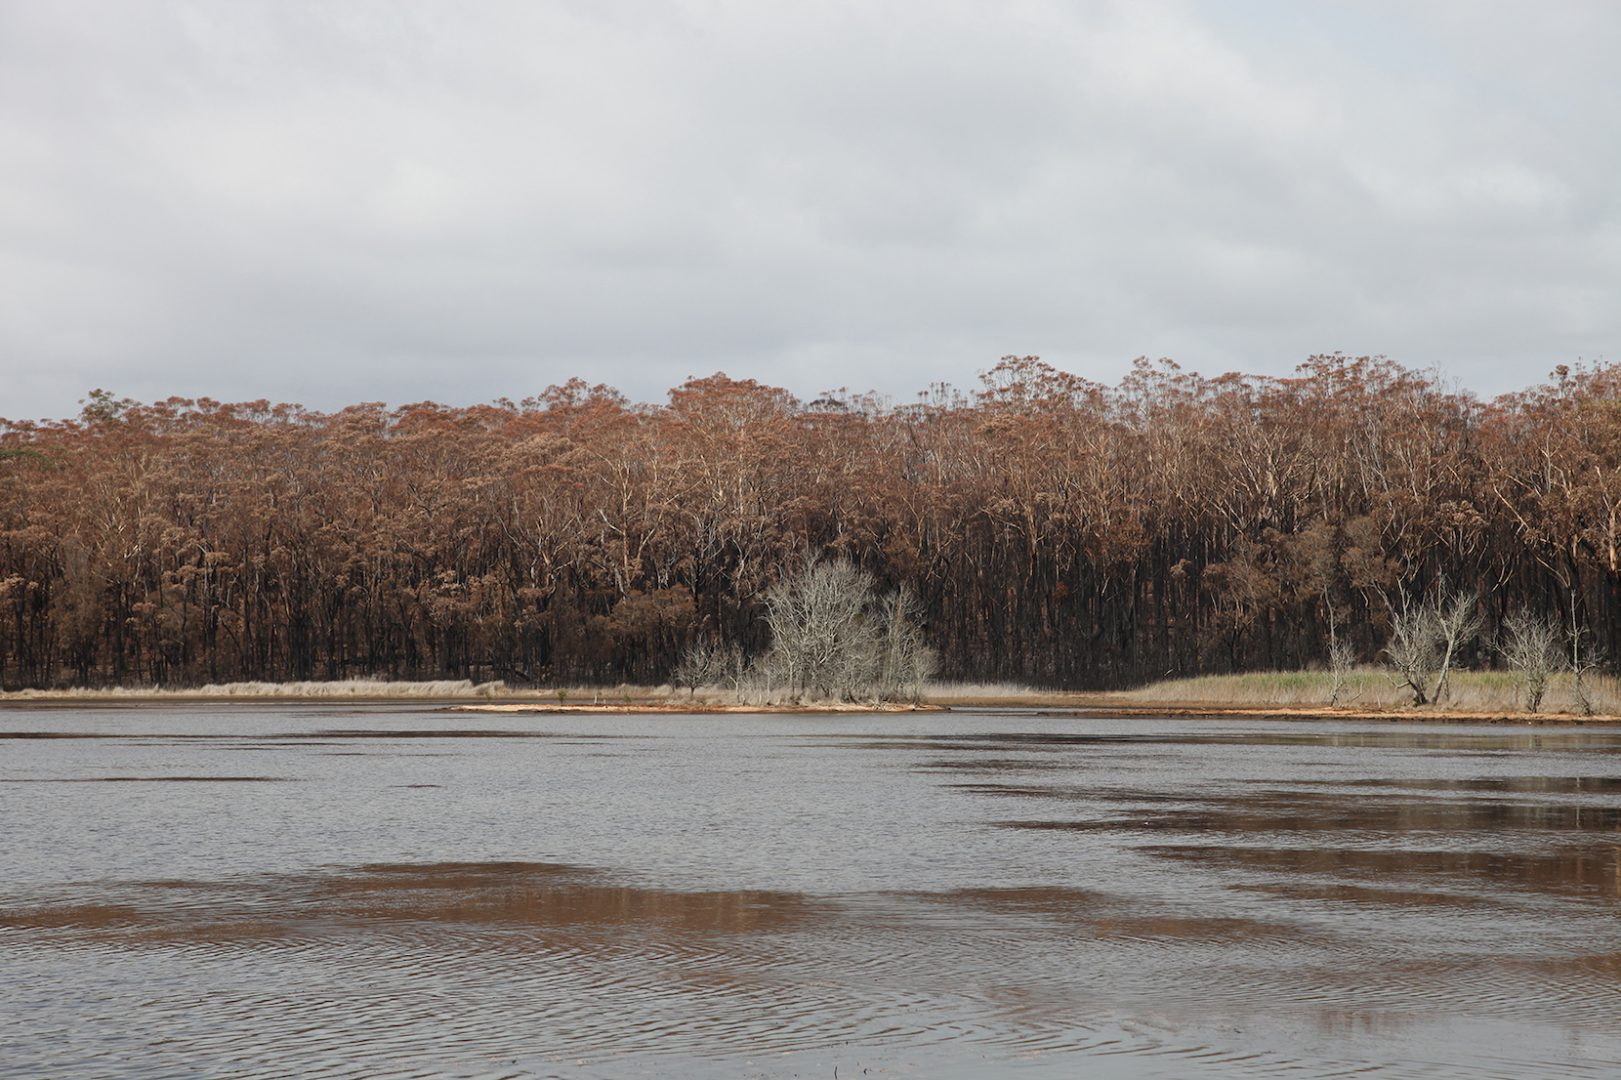 Artist and activist HAYDEN FOWLER on the Australian bushfires 9